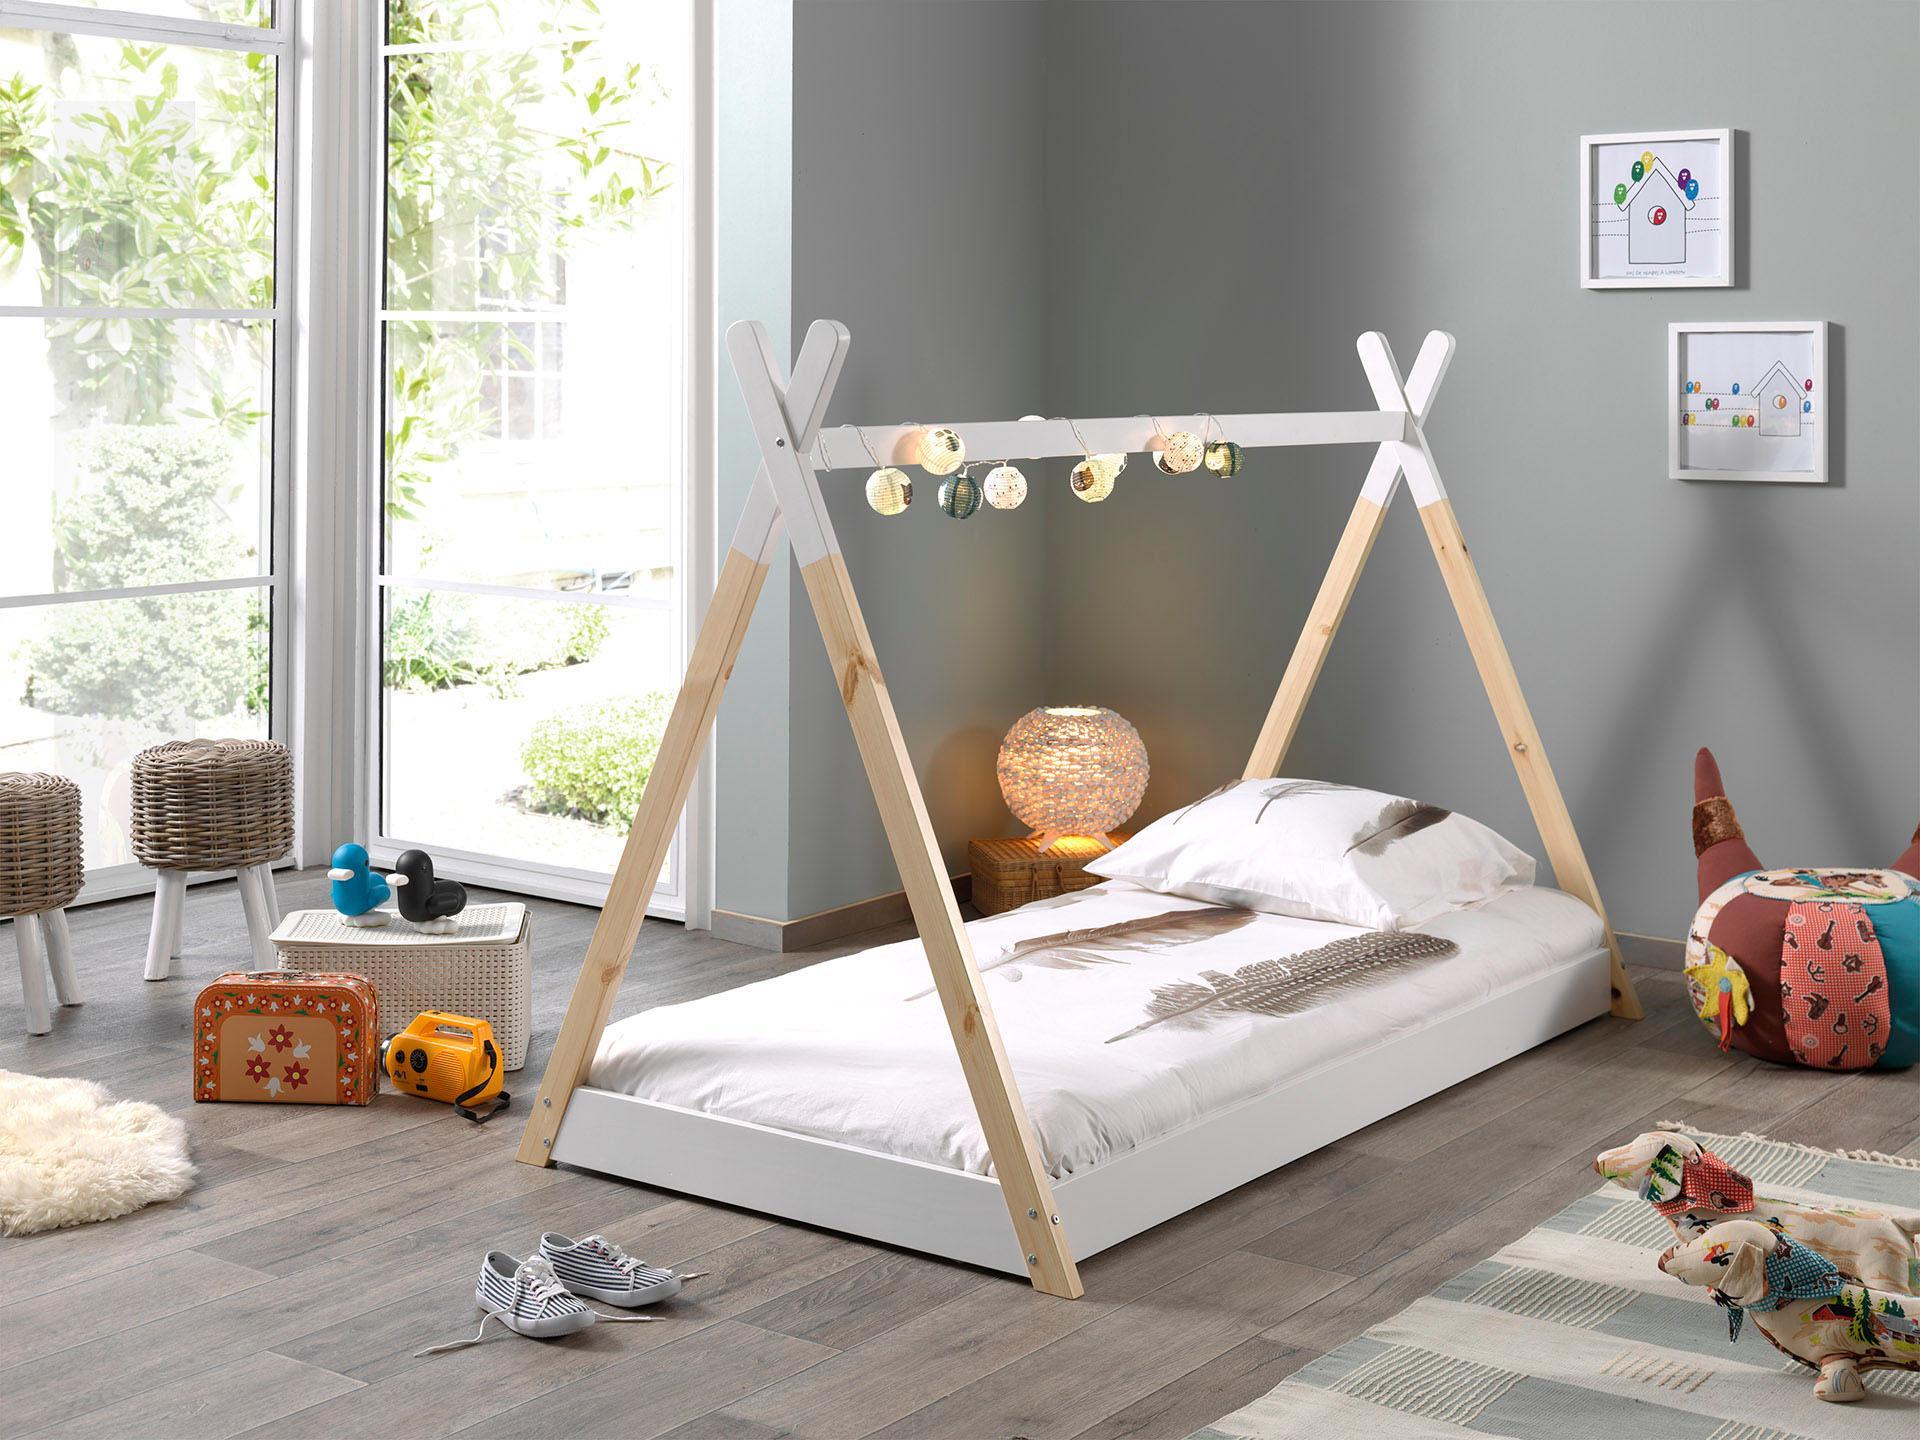 Vipack Kinderbett Tipi, mit Lattenrost weiß Kinder Kinderbetten Kindermöbel